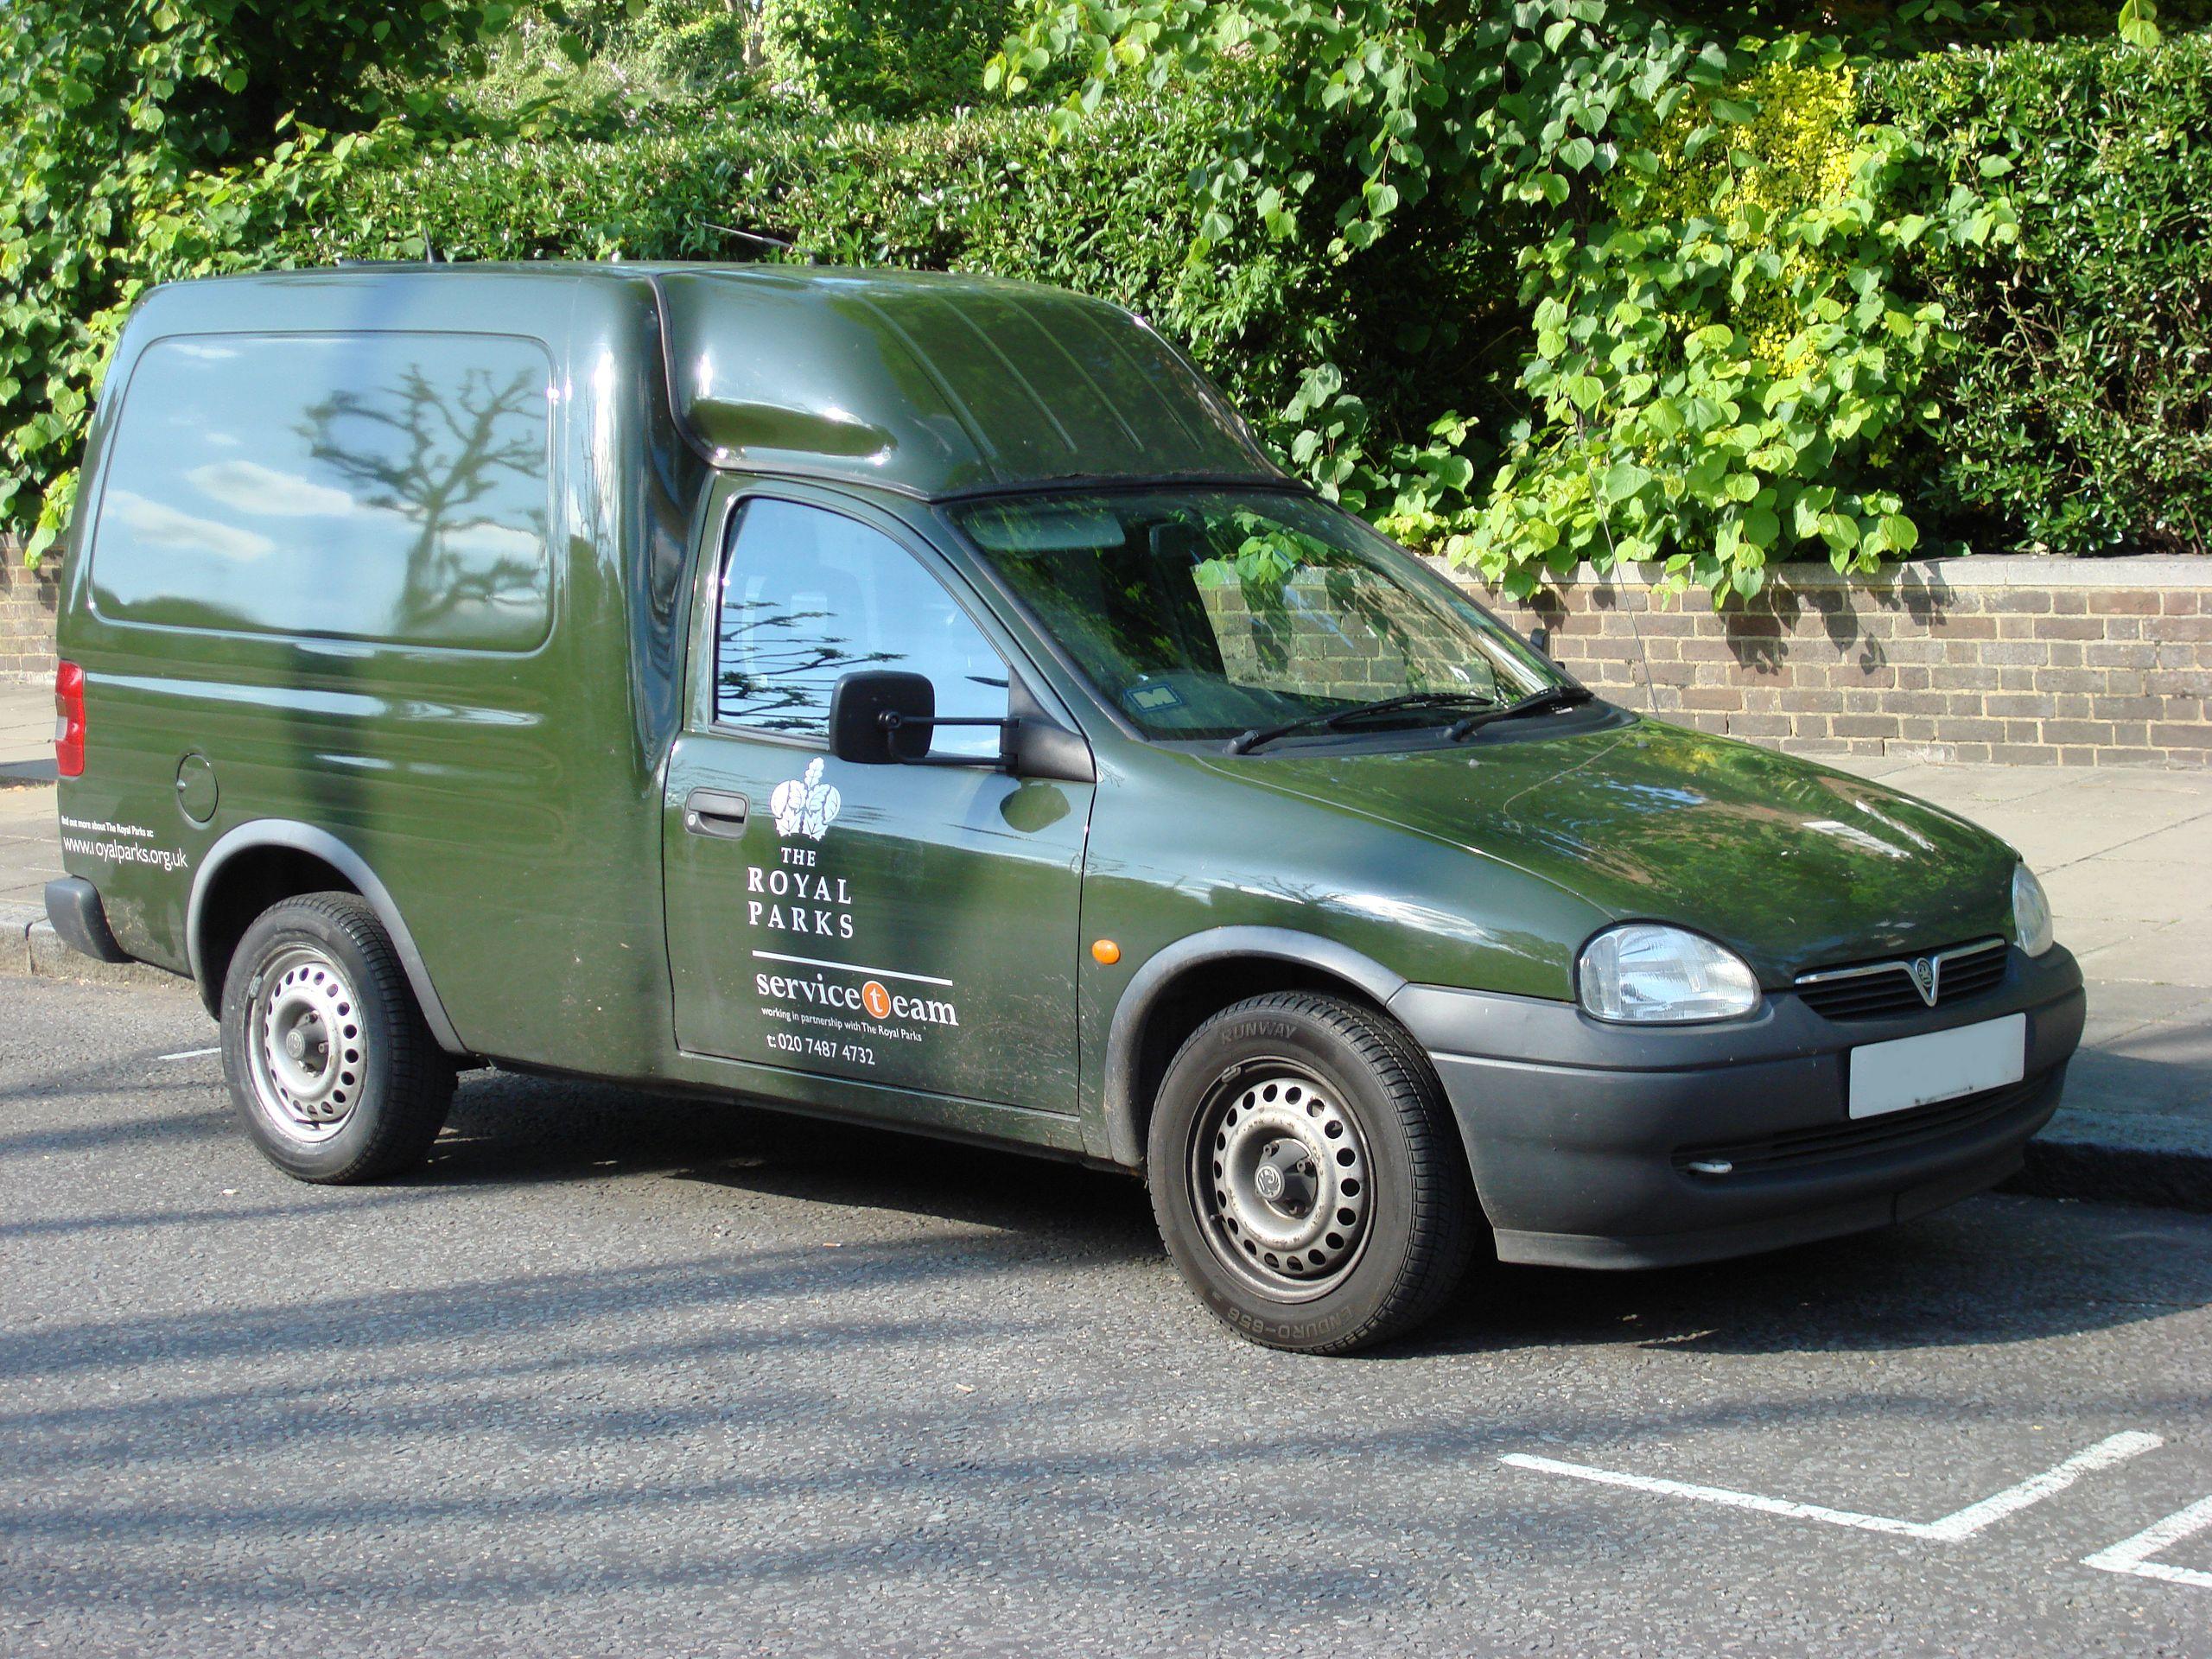 Vehicle Mv1 Mv4 Suv Mv2 Wwwmiifotoscom